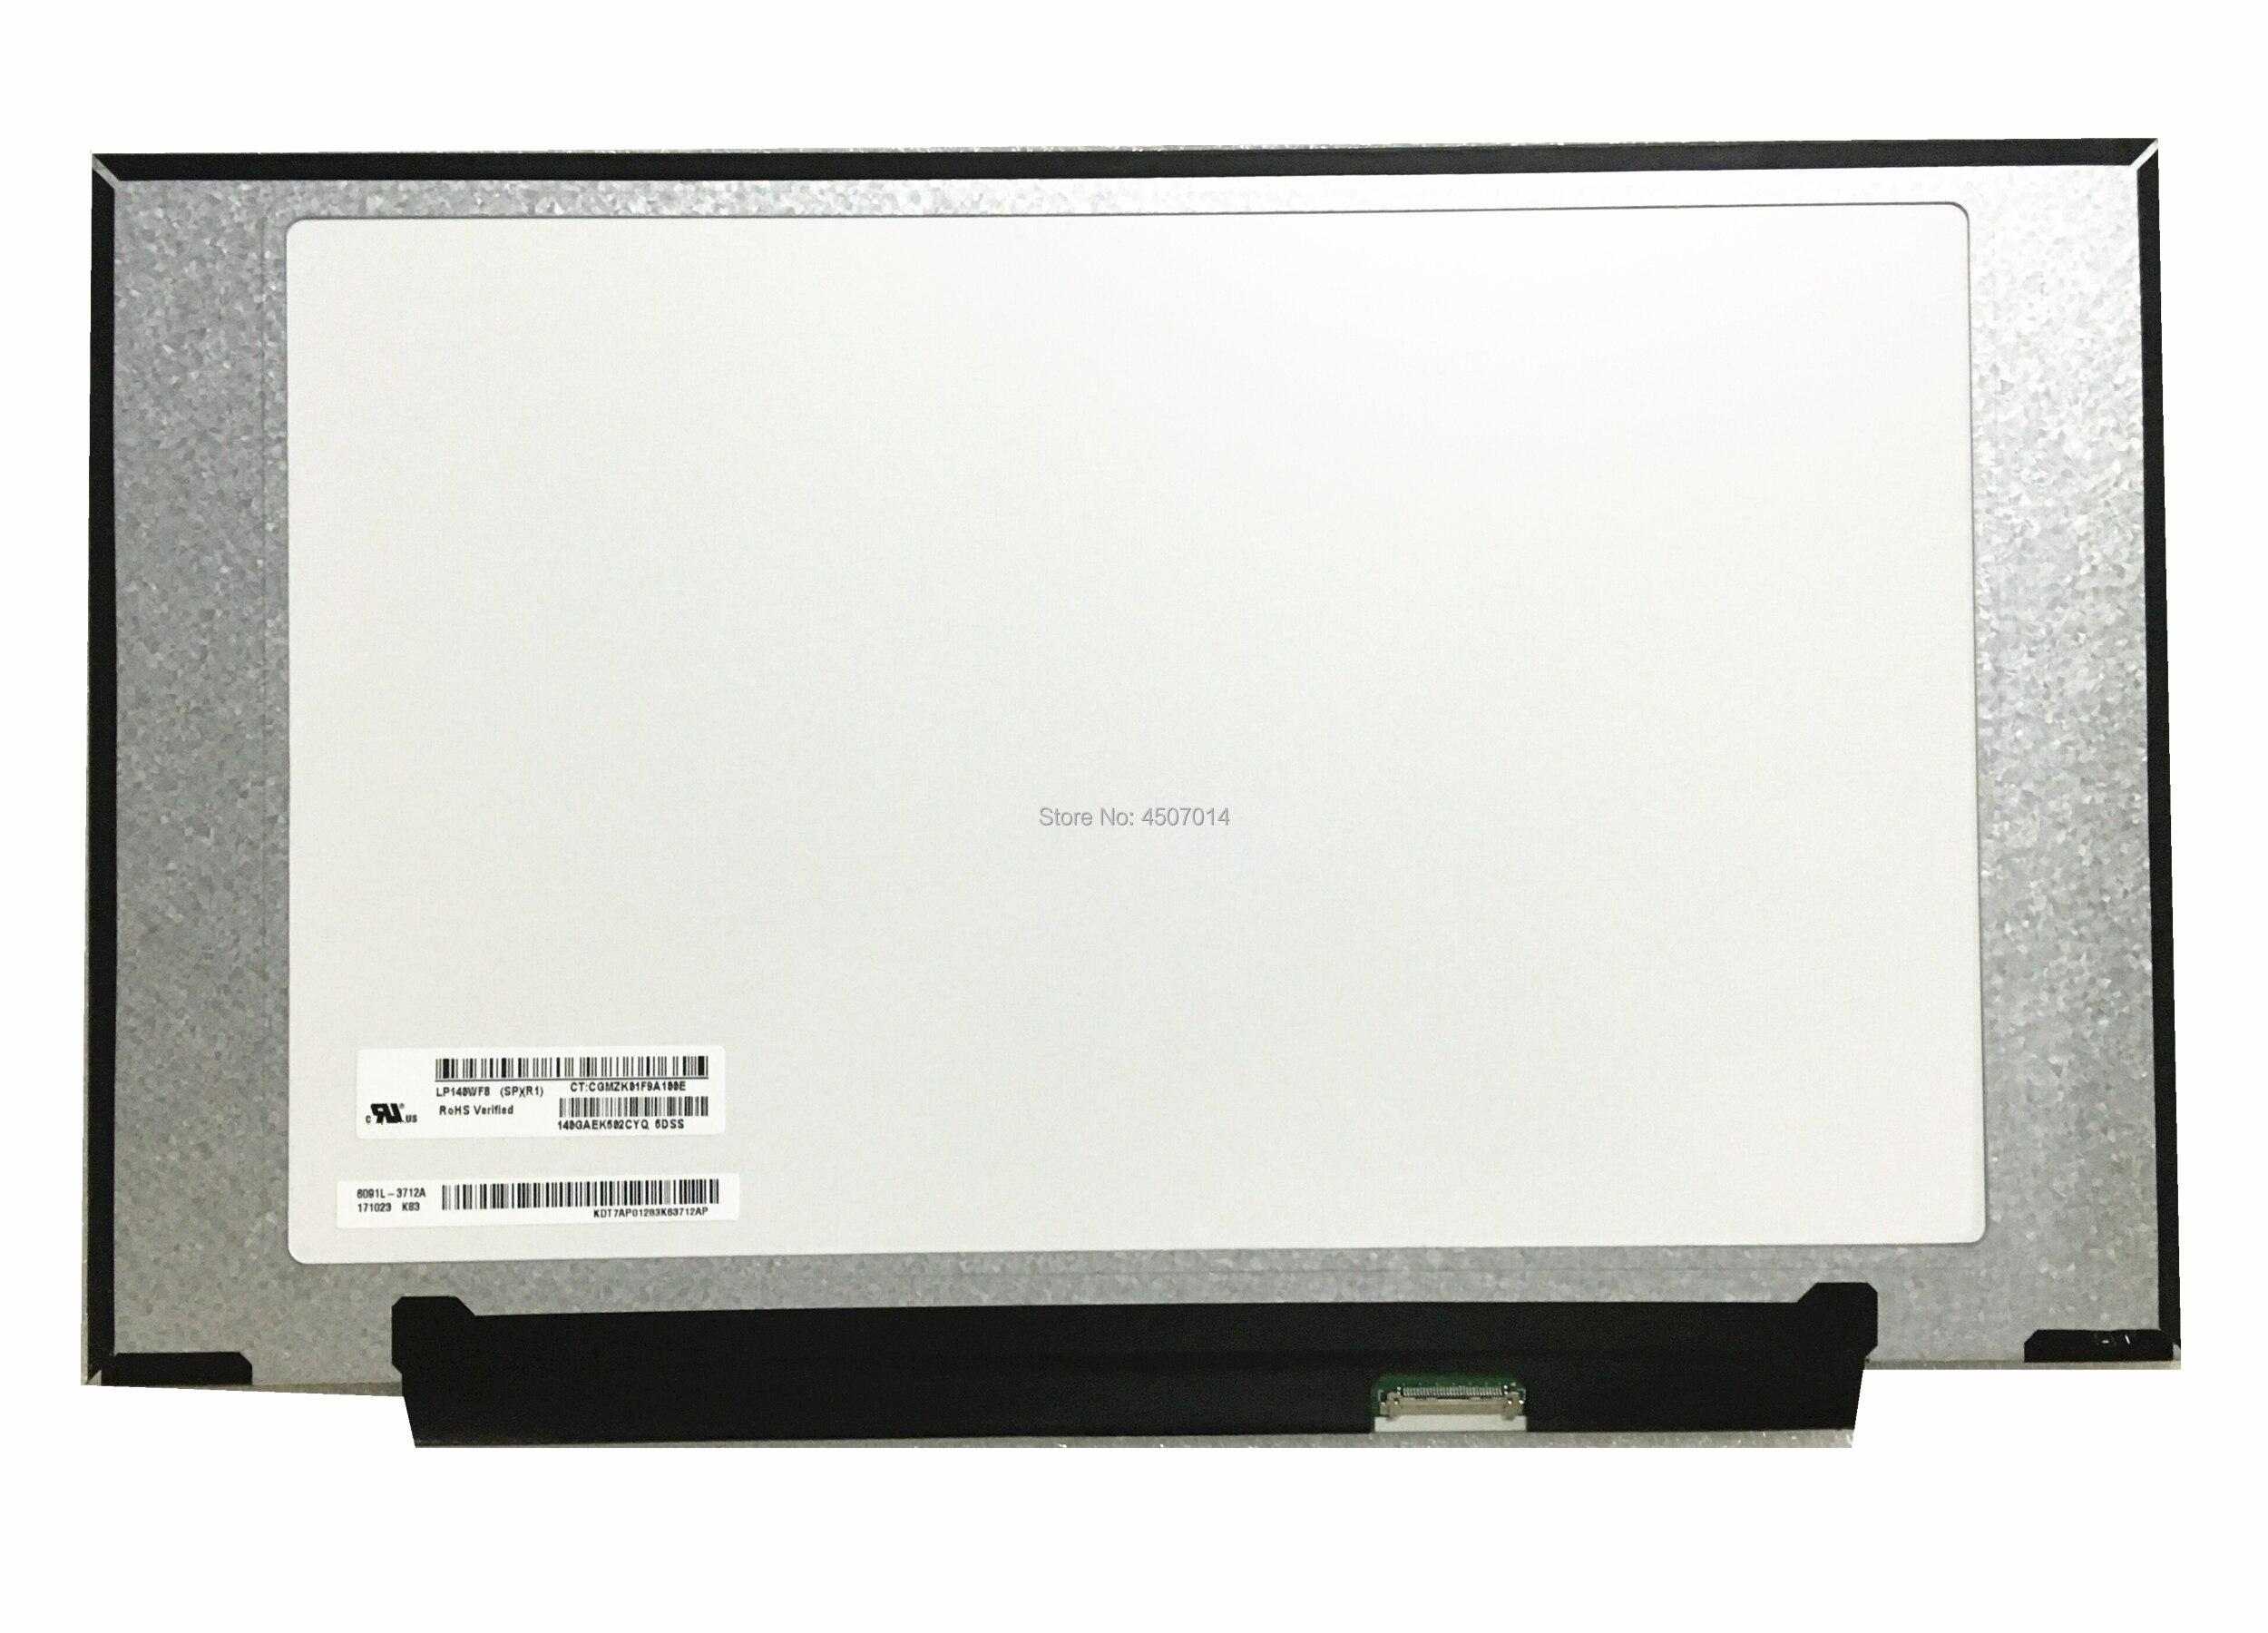 Free Shipping LP140WF8 SPR1 LP140WF8-SPR1 14.0inch Laptop Lcd Screen 1920*1080 EDP 30 PinsFree Shipping LP140WF8 SPR1 LP140WF8-SPR1 14.0inch Laptop Lcd Screen 1920*1080 EDP 30 Pins